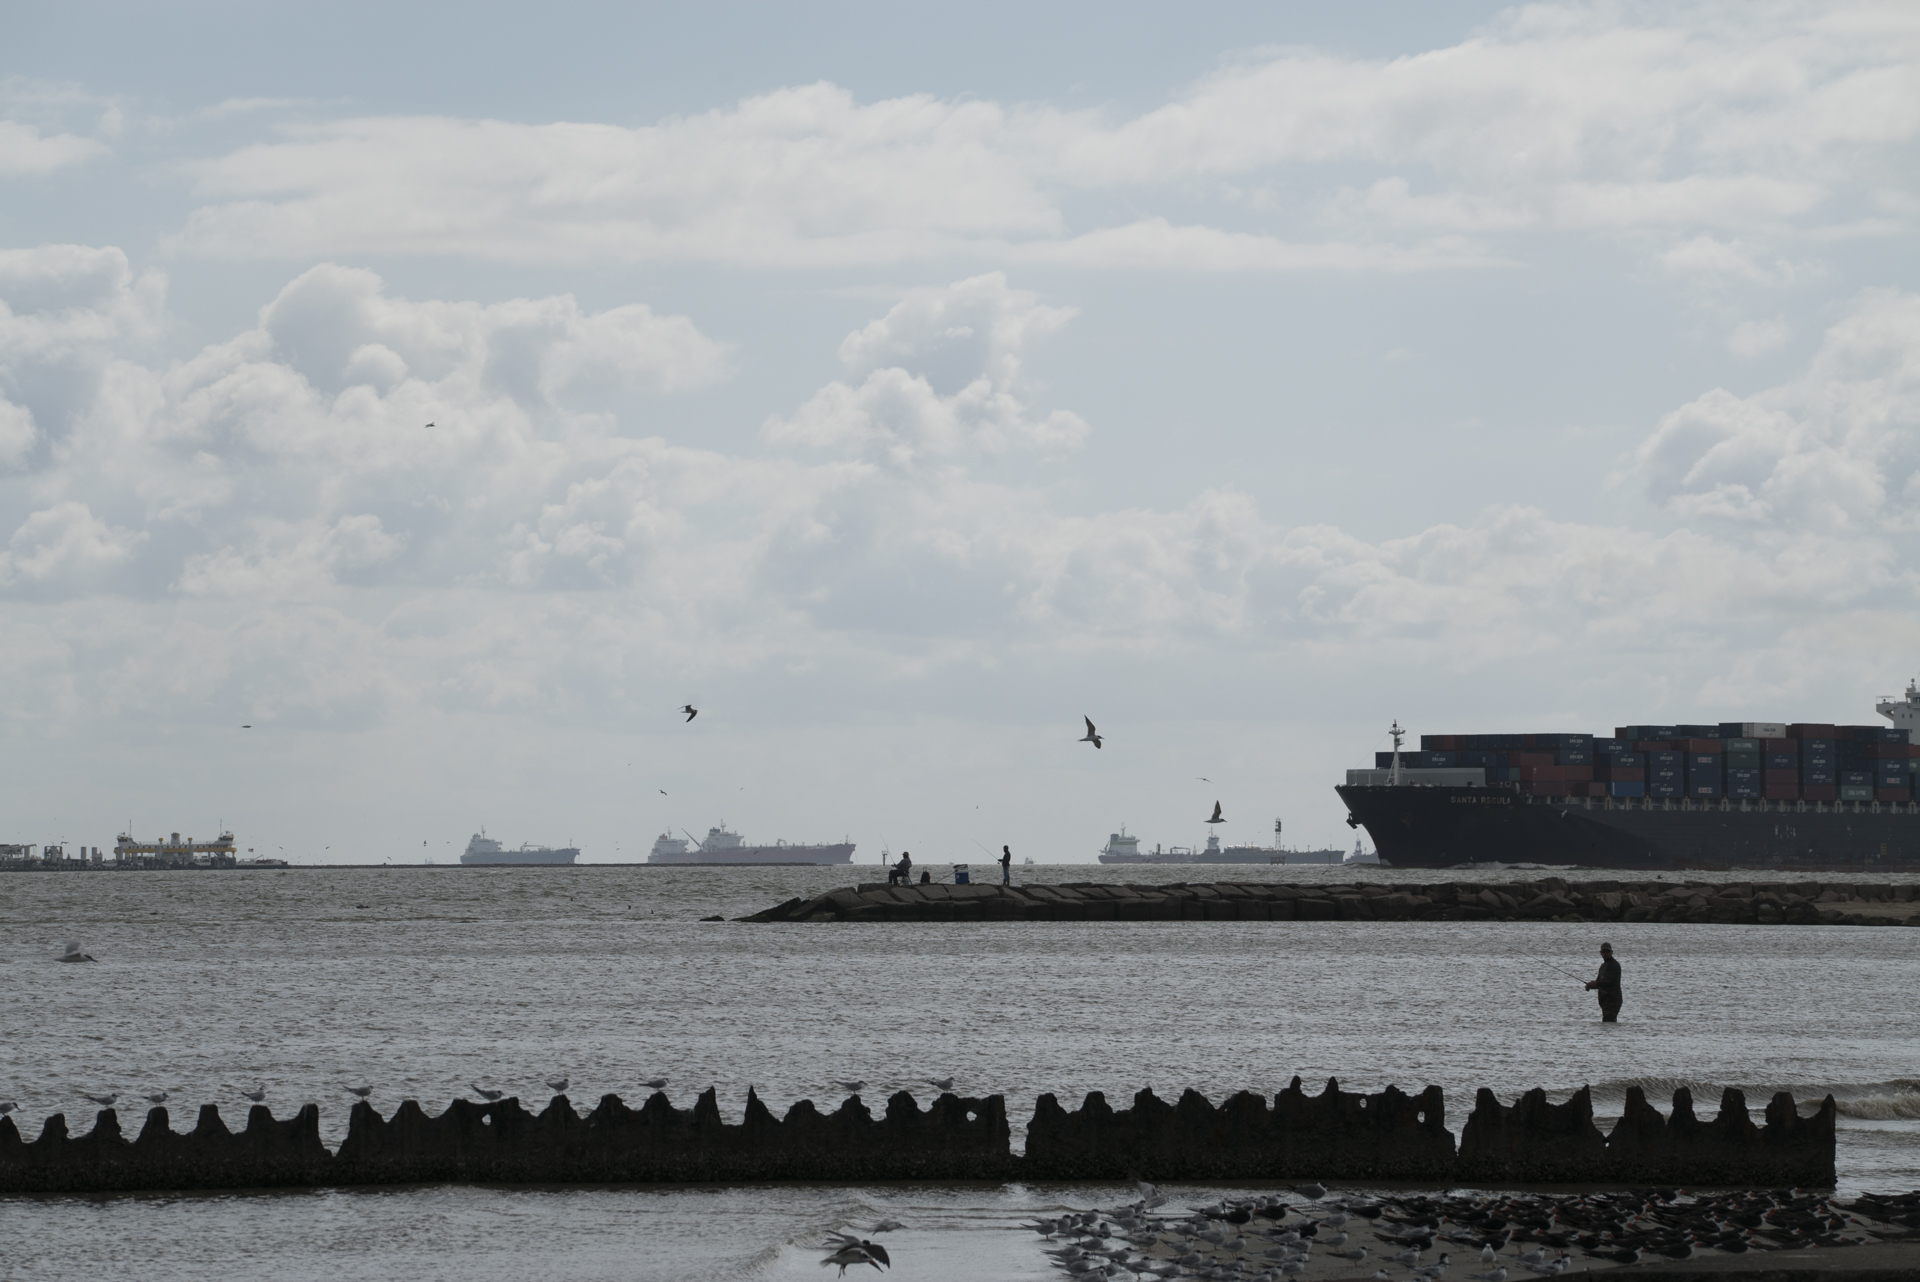 Shipping traffic heads into Galveston Bay near Texas City, Texas.